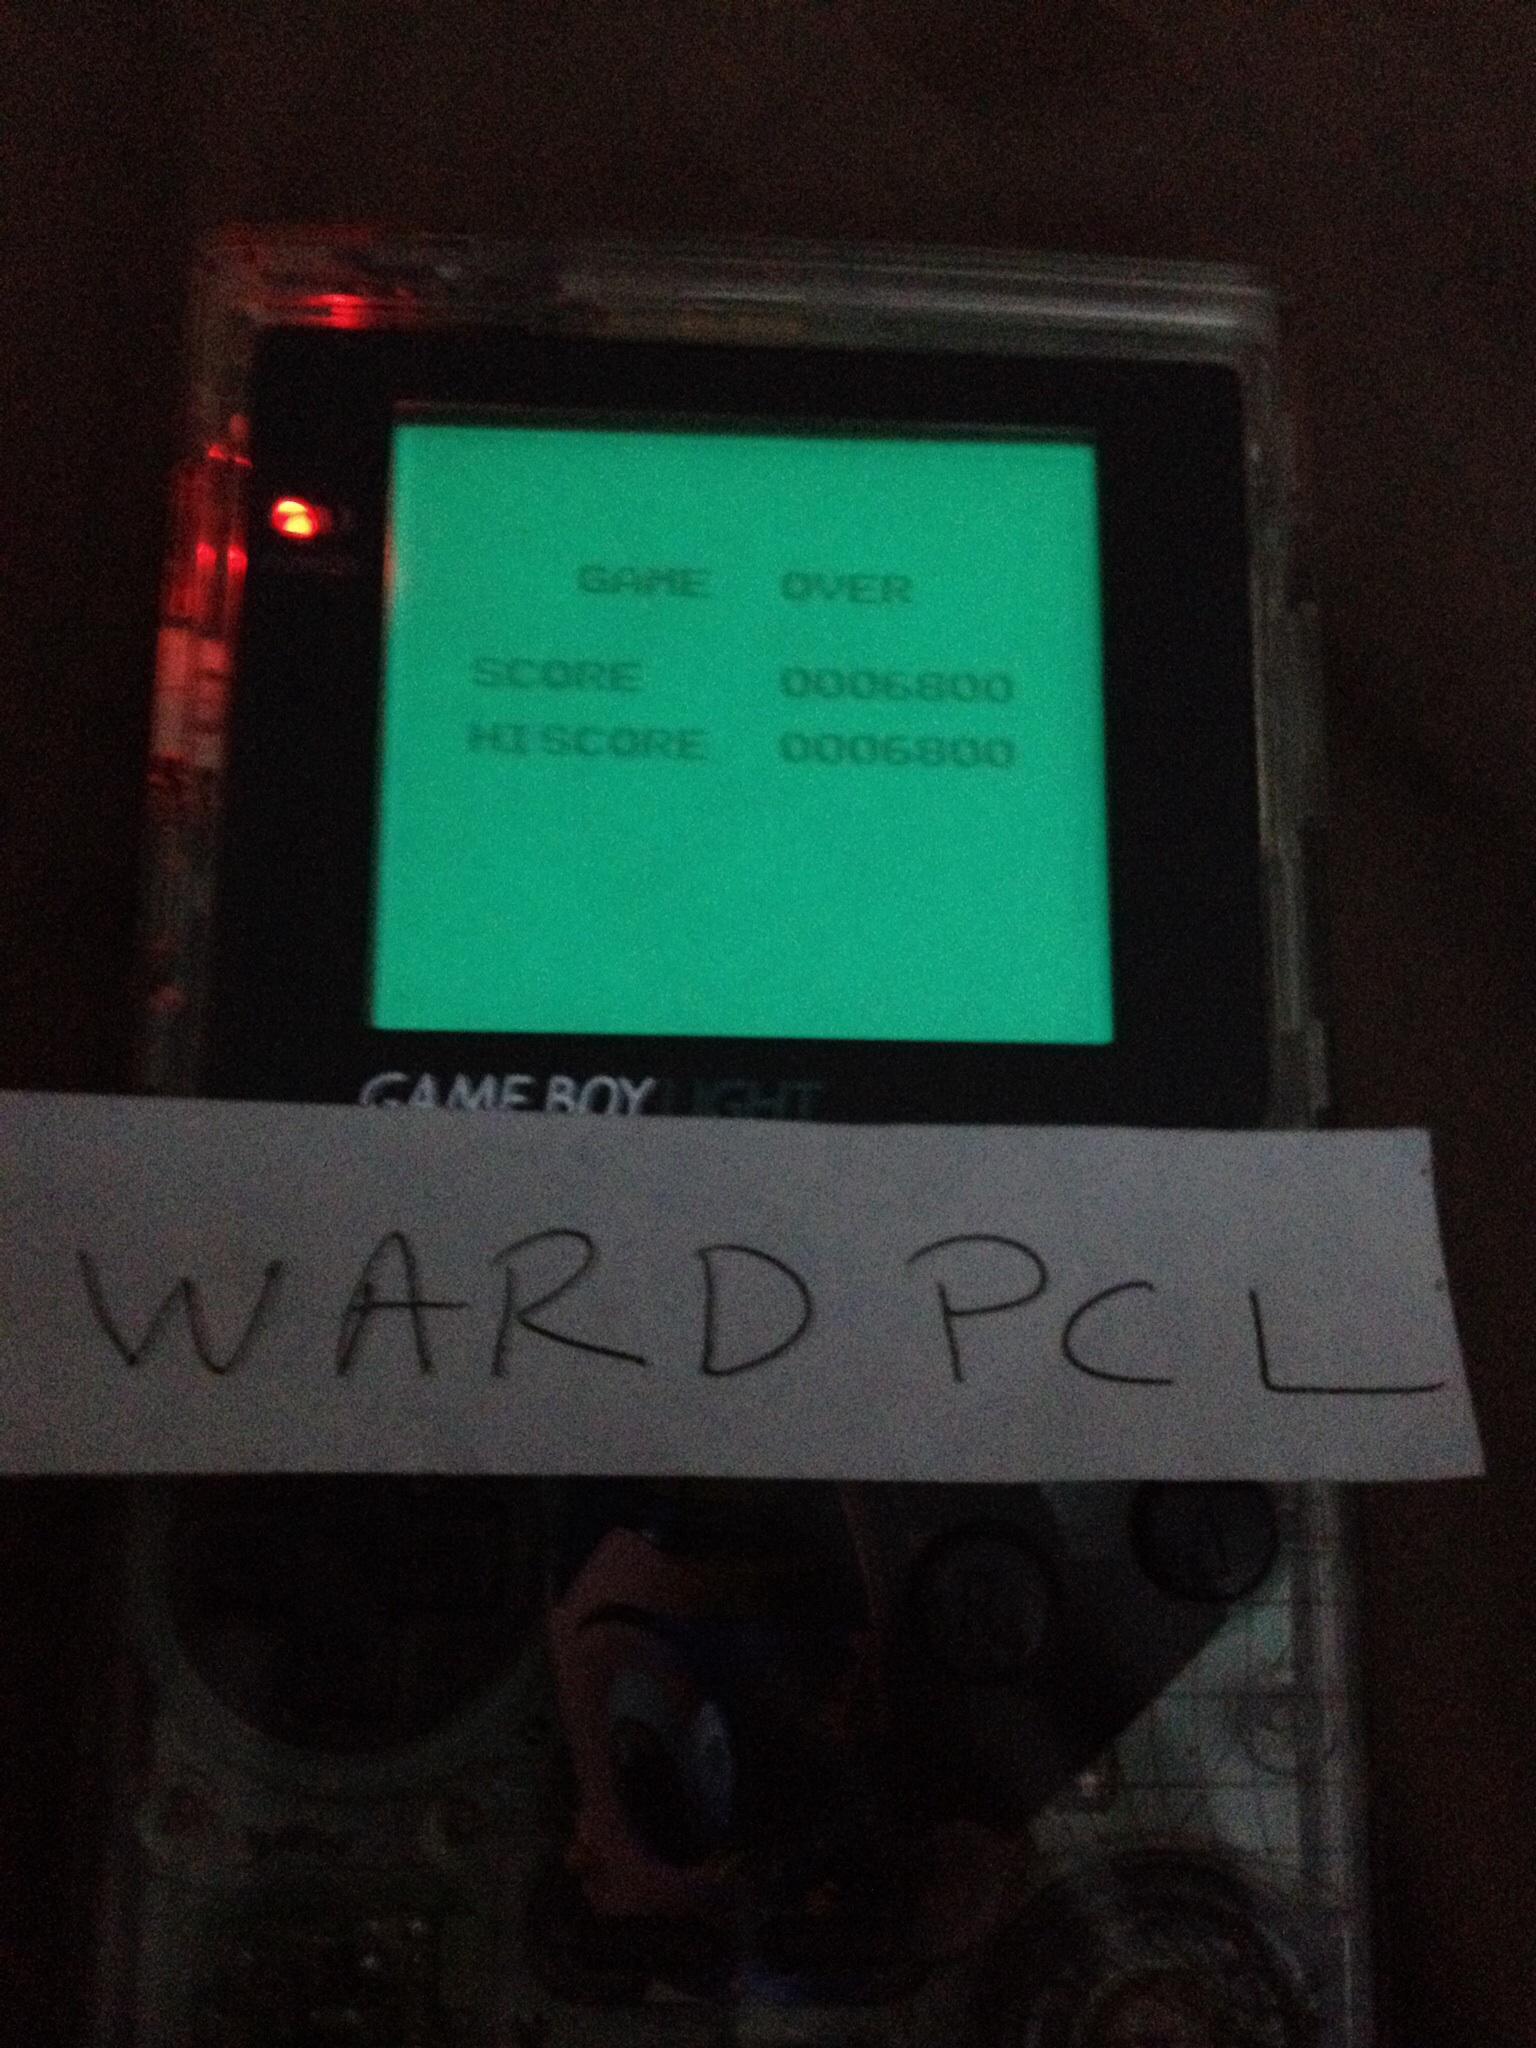 Wardpcl: Hyper Lode Runner (Game Boy) 6,800 points on 2015-07-18 07:39:35